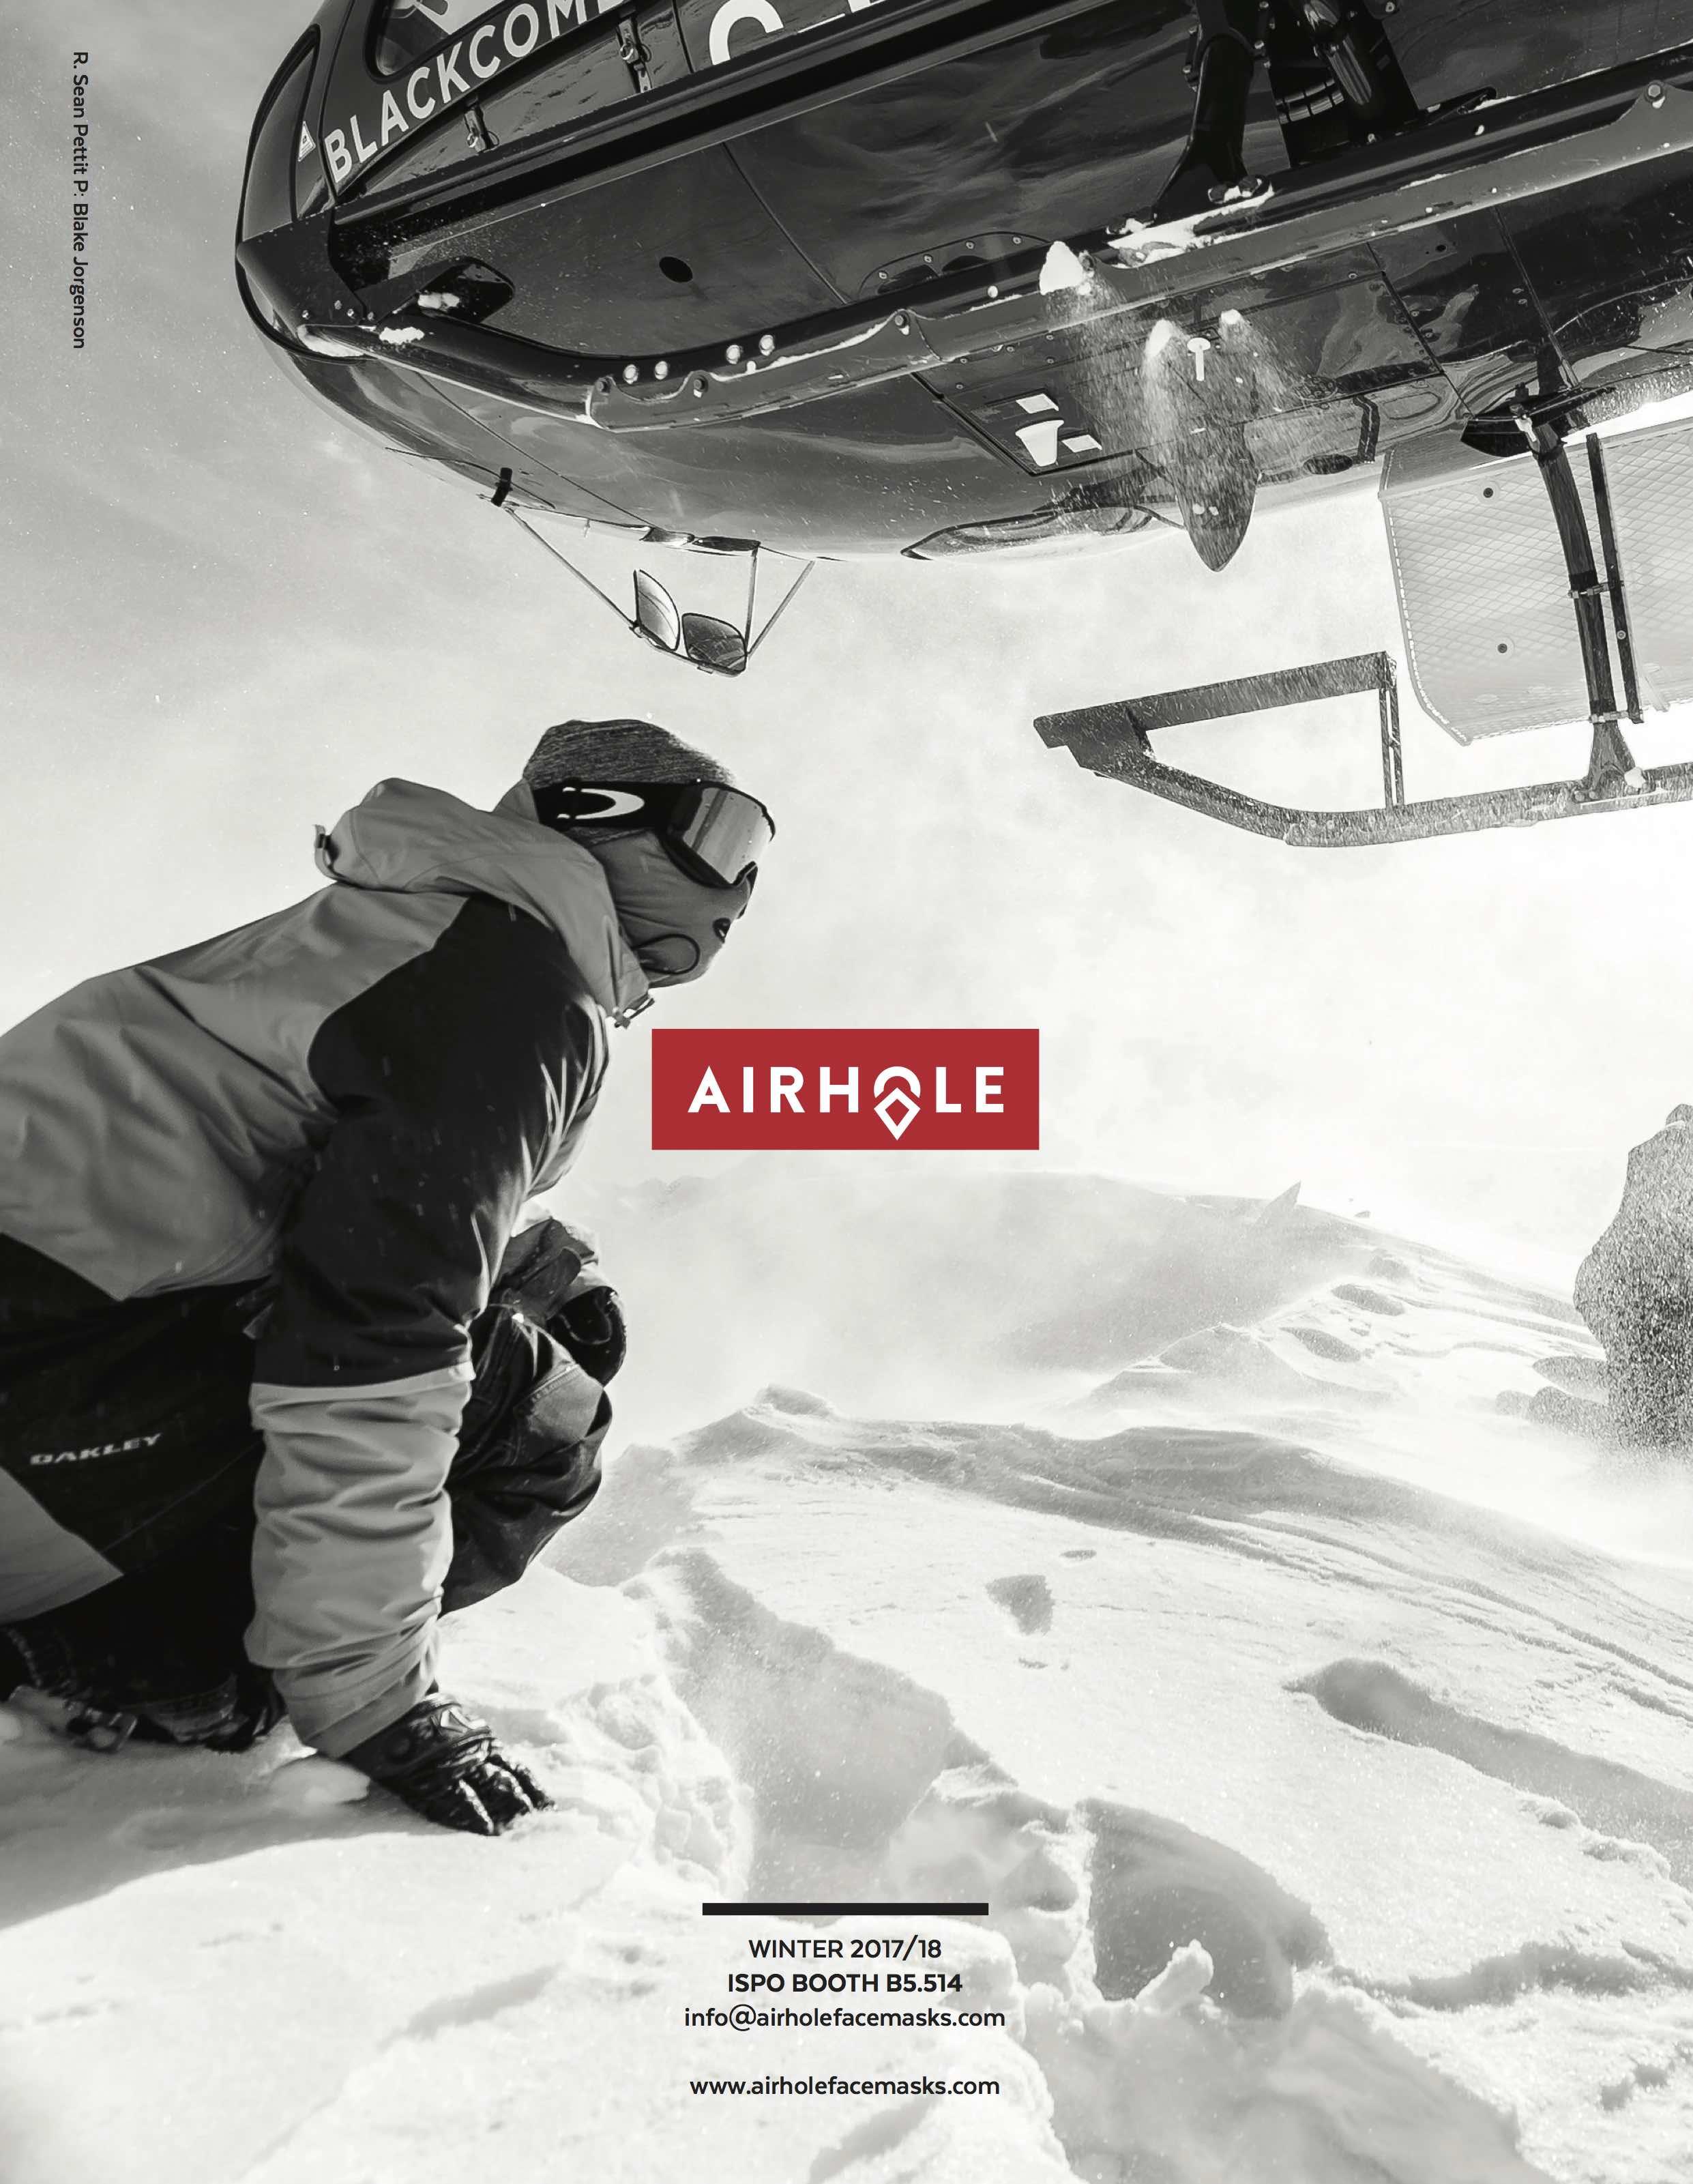 84 Airhole SNOW